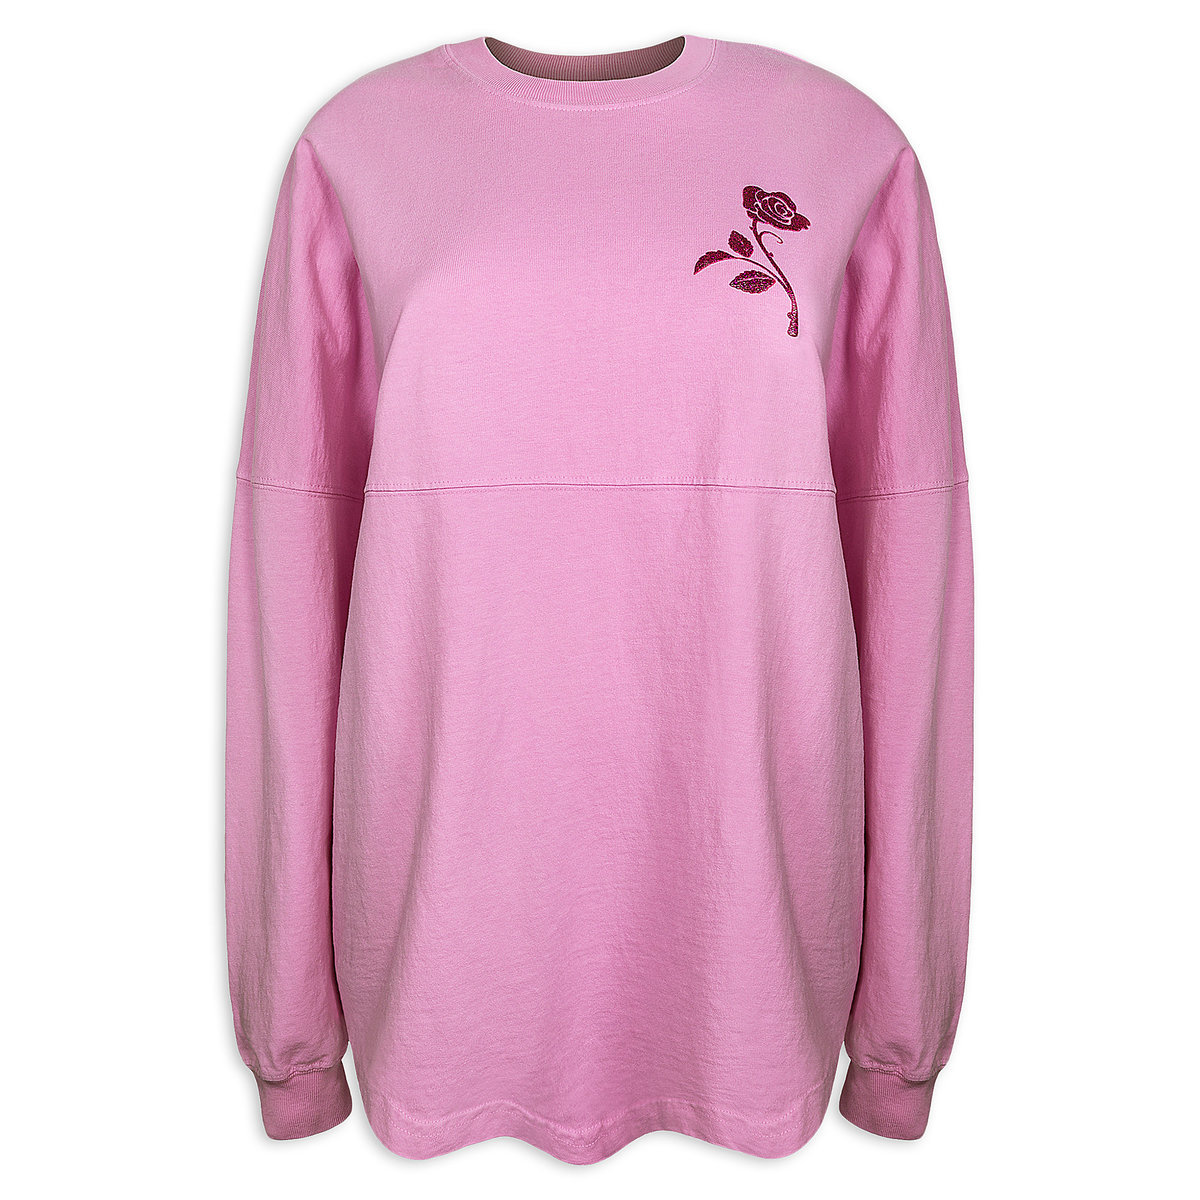 Product Image of Aurora Spirit Jersey for Adults - Walt Disney World # 2